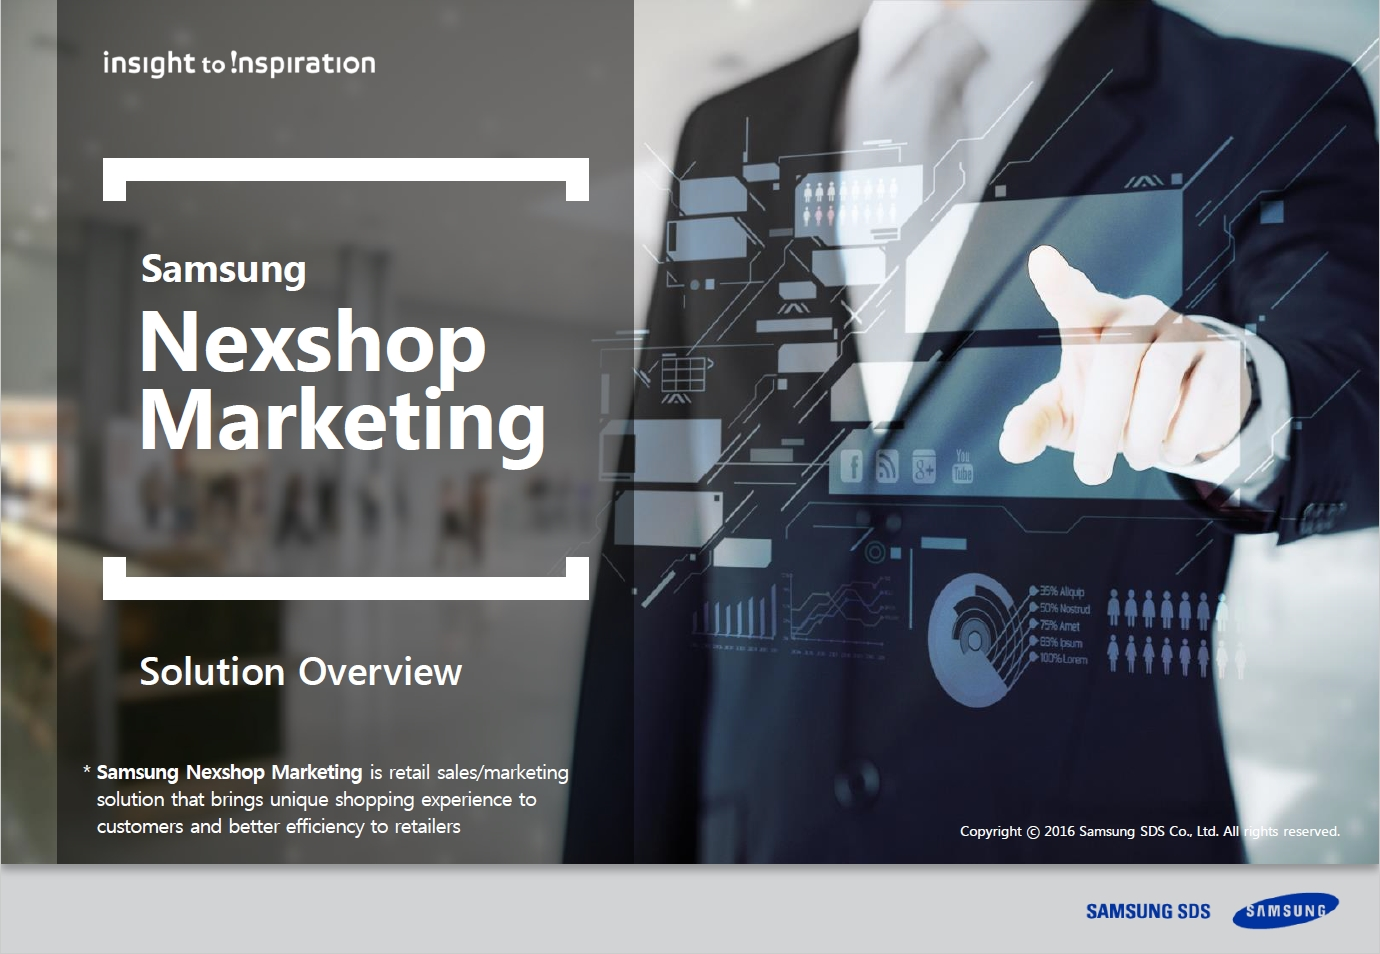 [Nexshop Marketing] Discover the future of interactive digital marketing